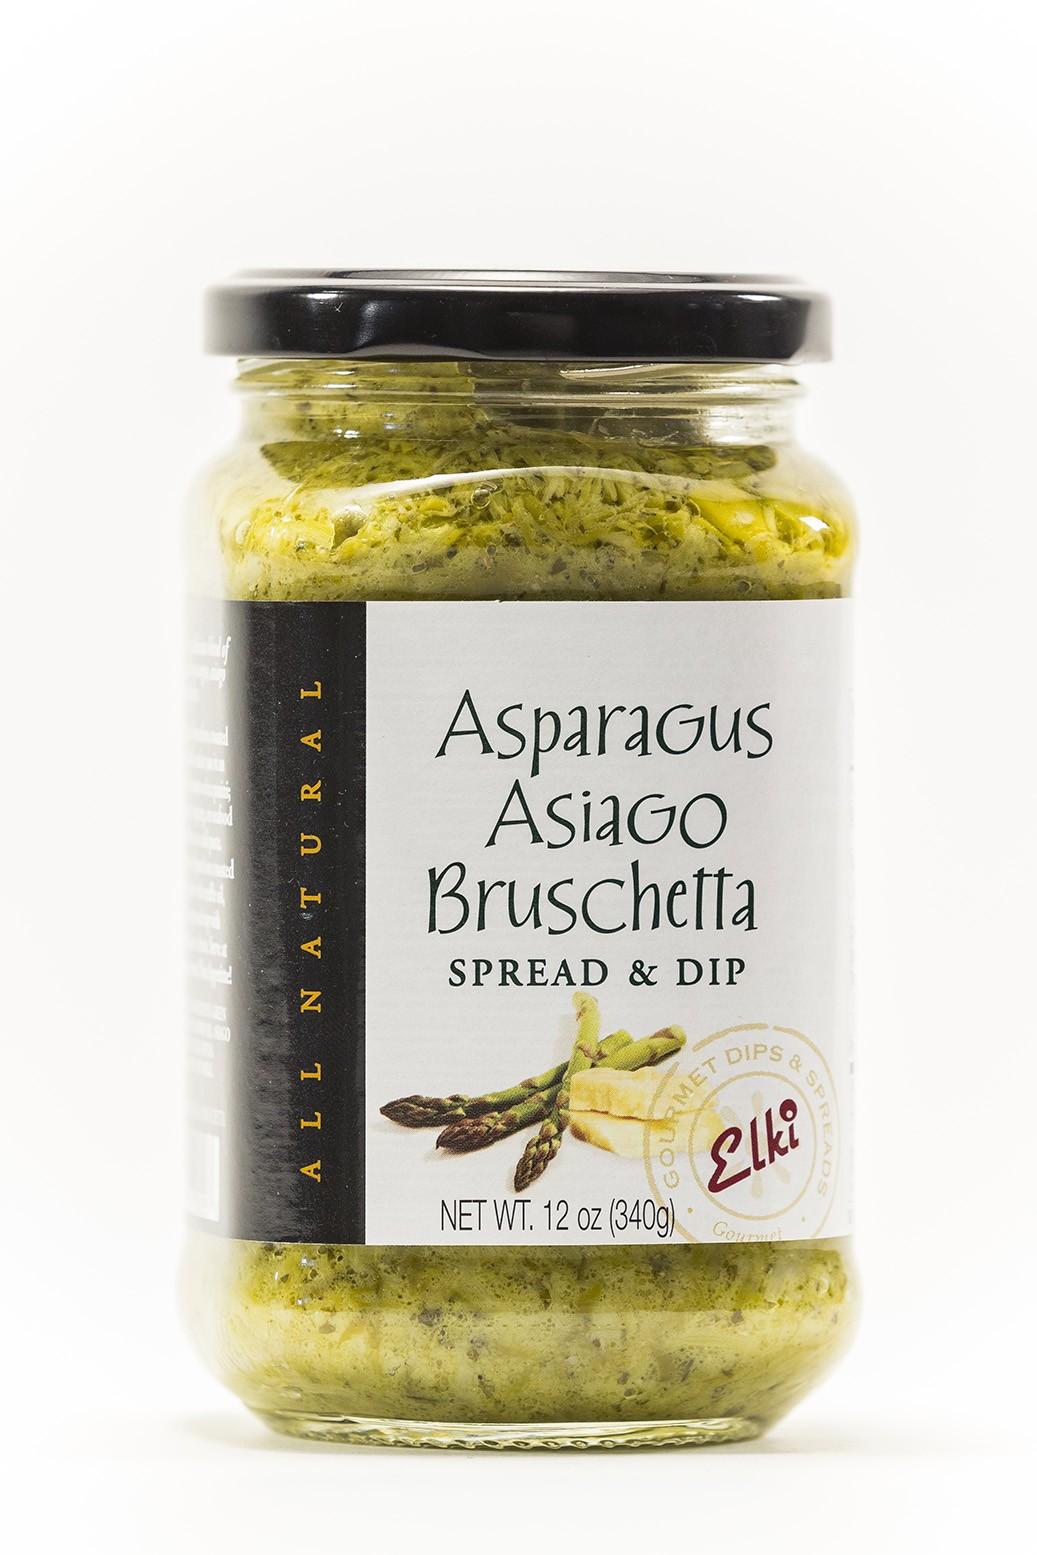 Asparagus Asiago Bruschetta